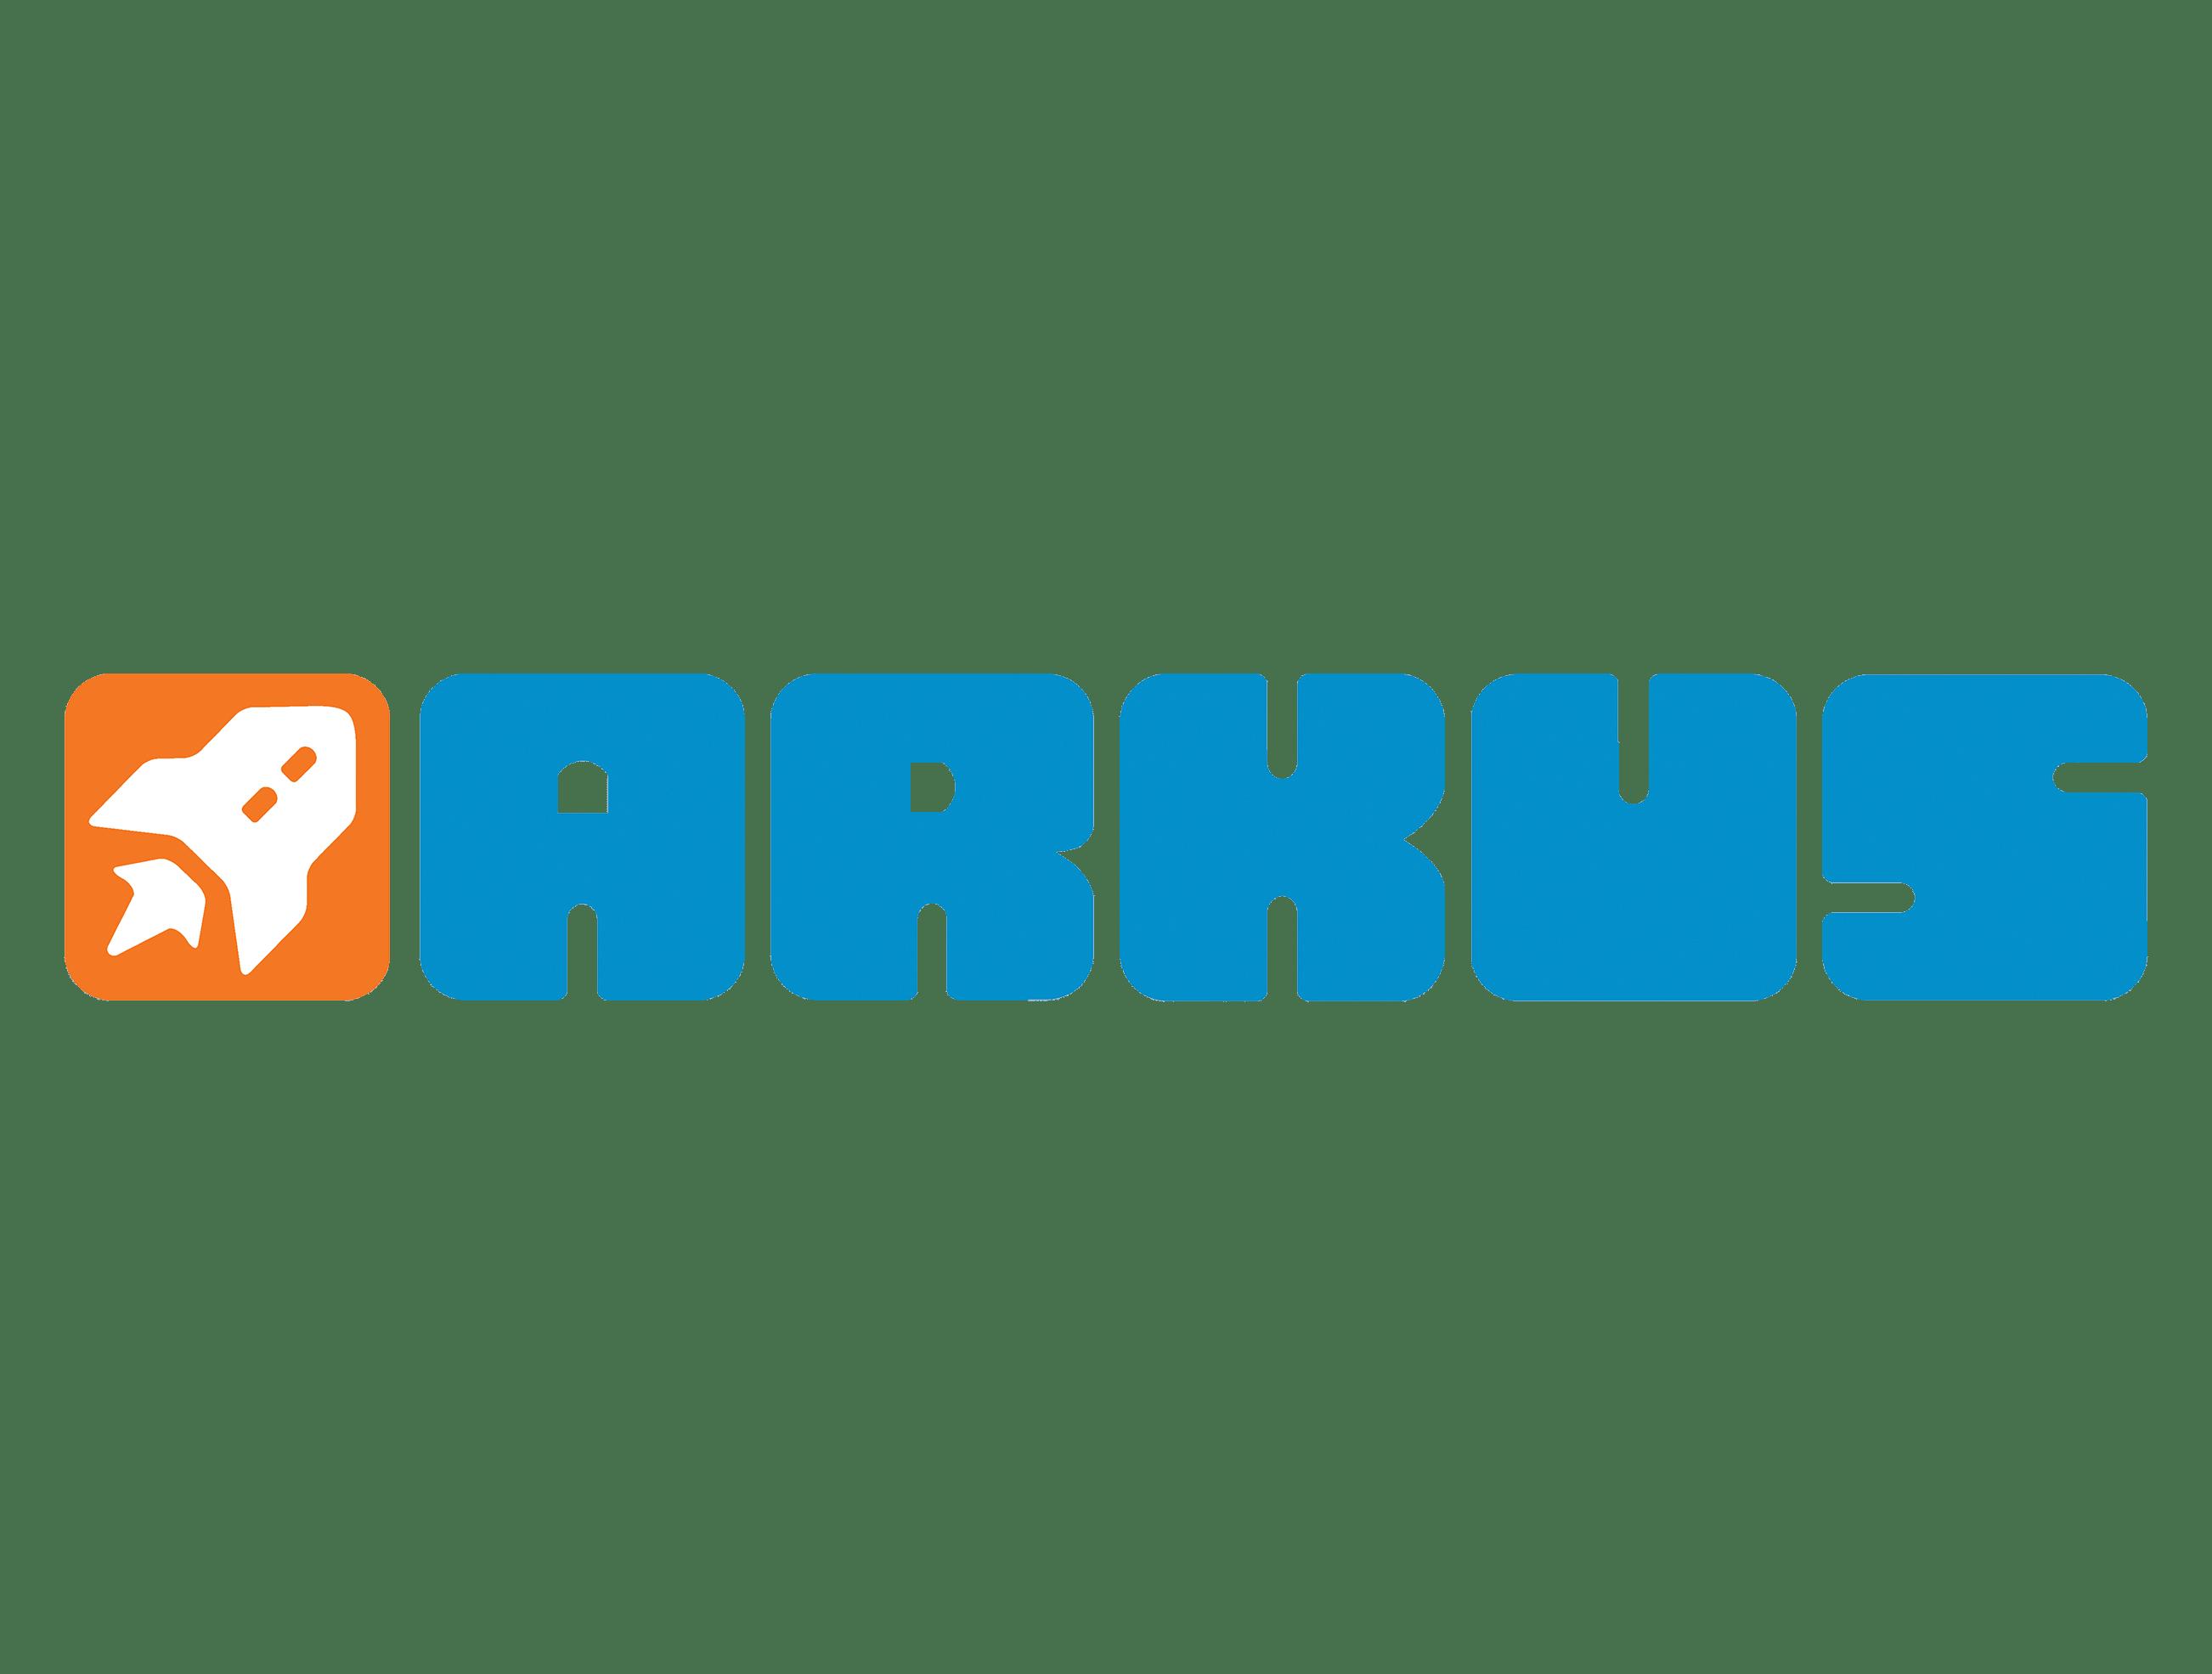 logo_arkusgames_meeplefoundry